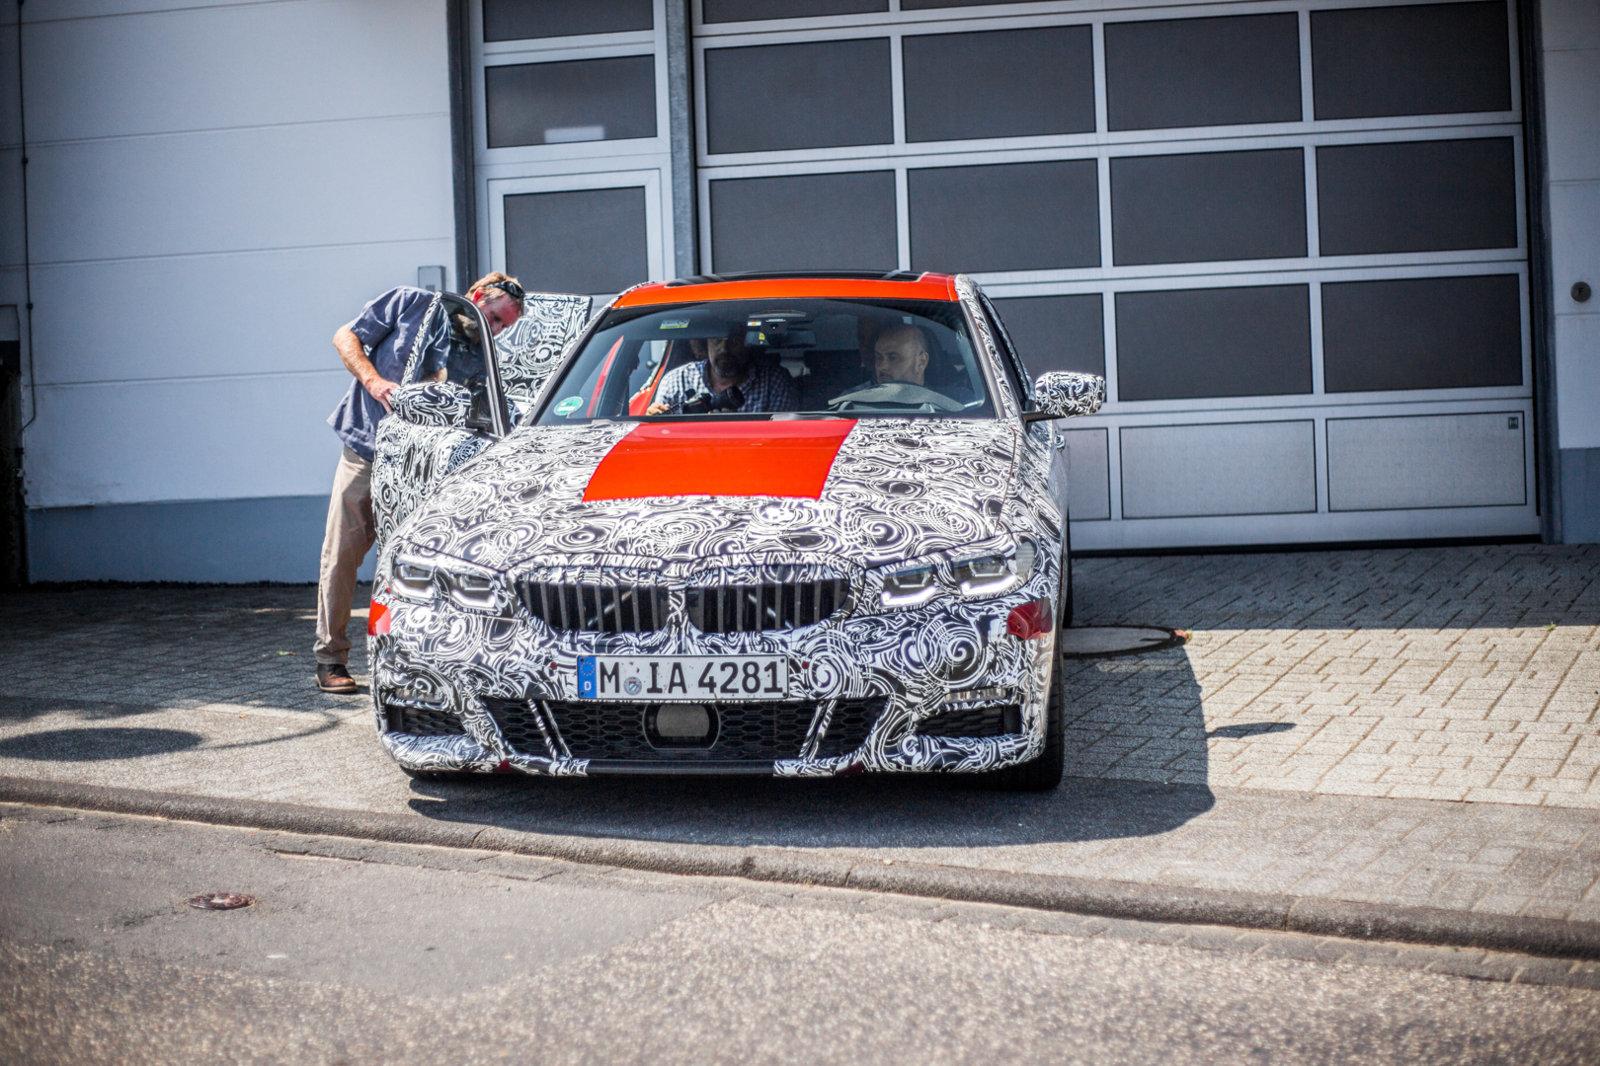 2019 BMW G20 interior shots | BMW - SpoolStreet